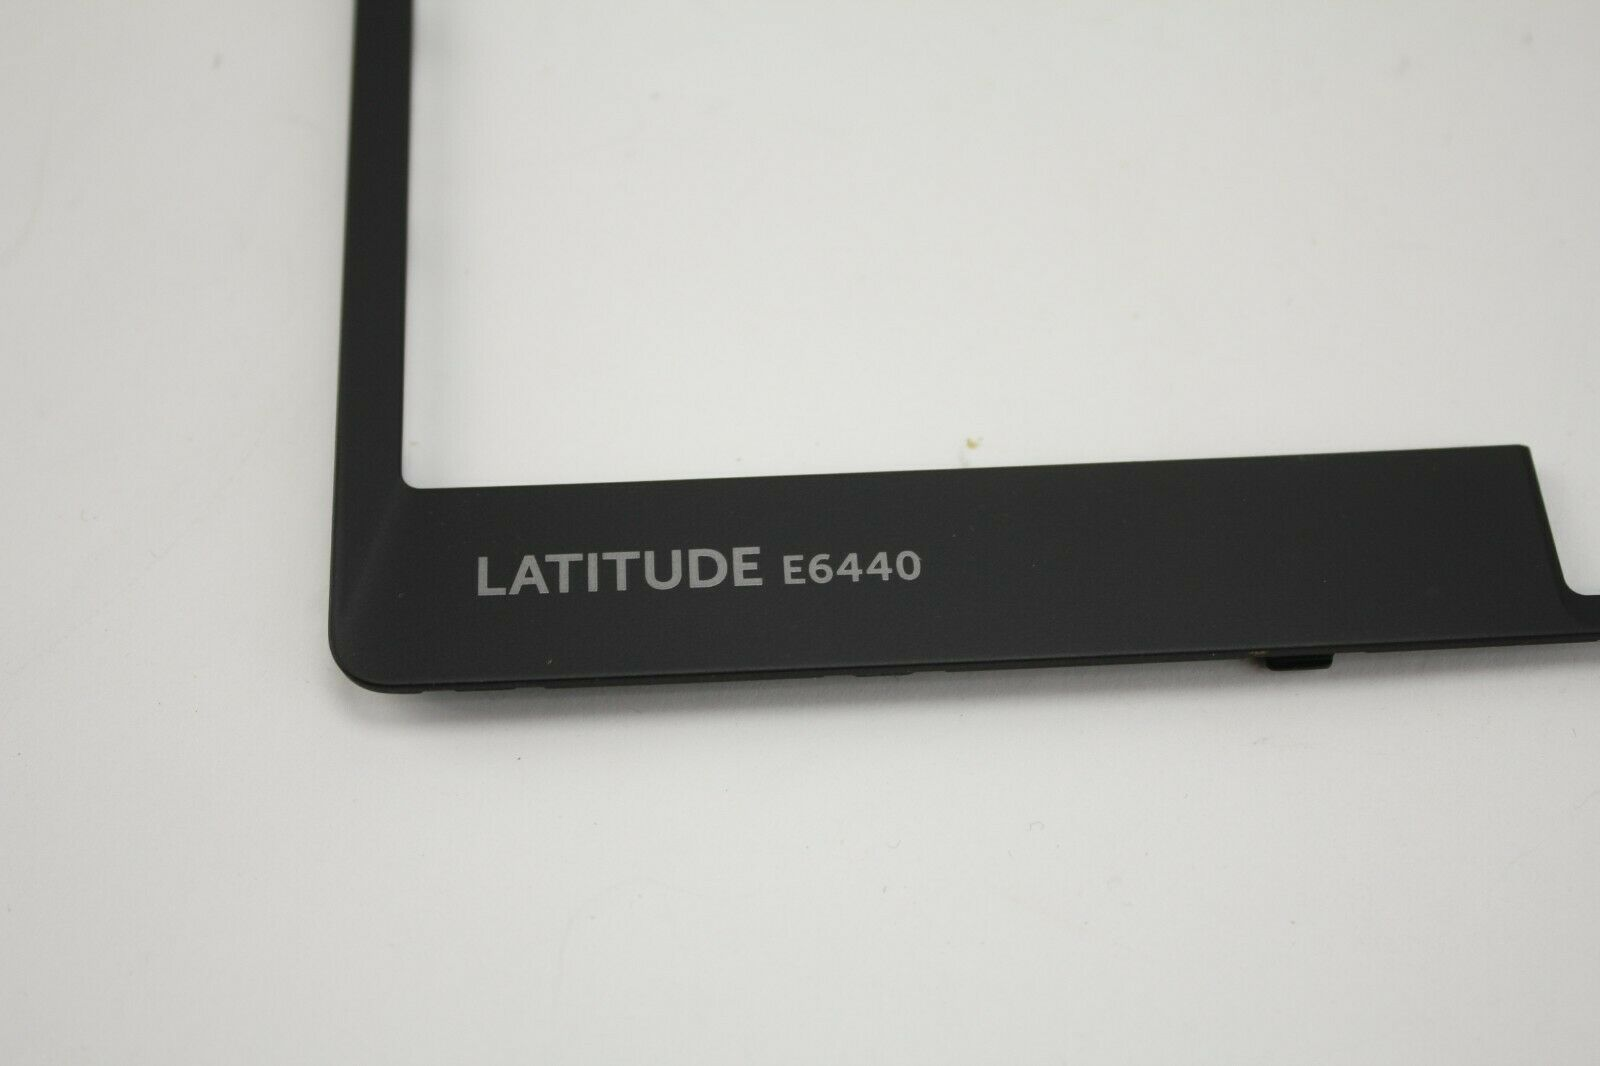 Dell Latitude E6440 Laptop Keyboard Surround Bezel Trim 07J94 007J94 CN-007J94